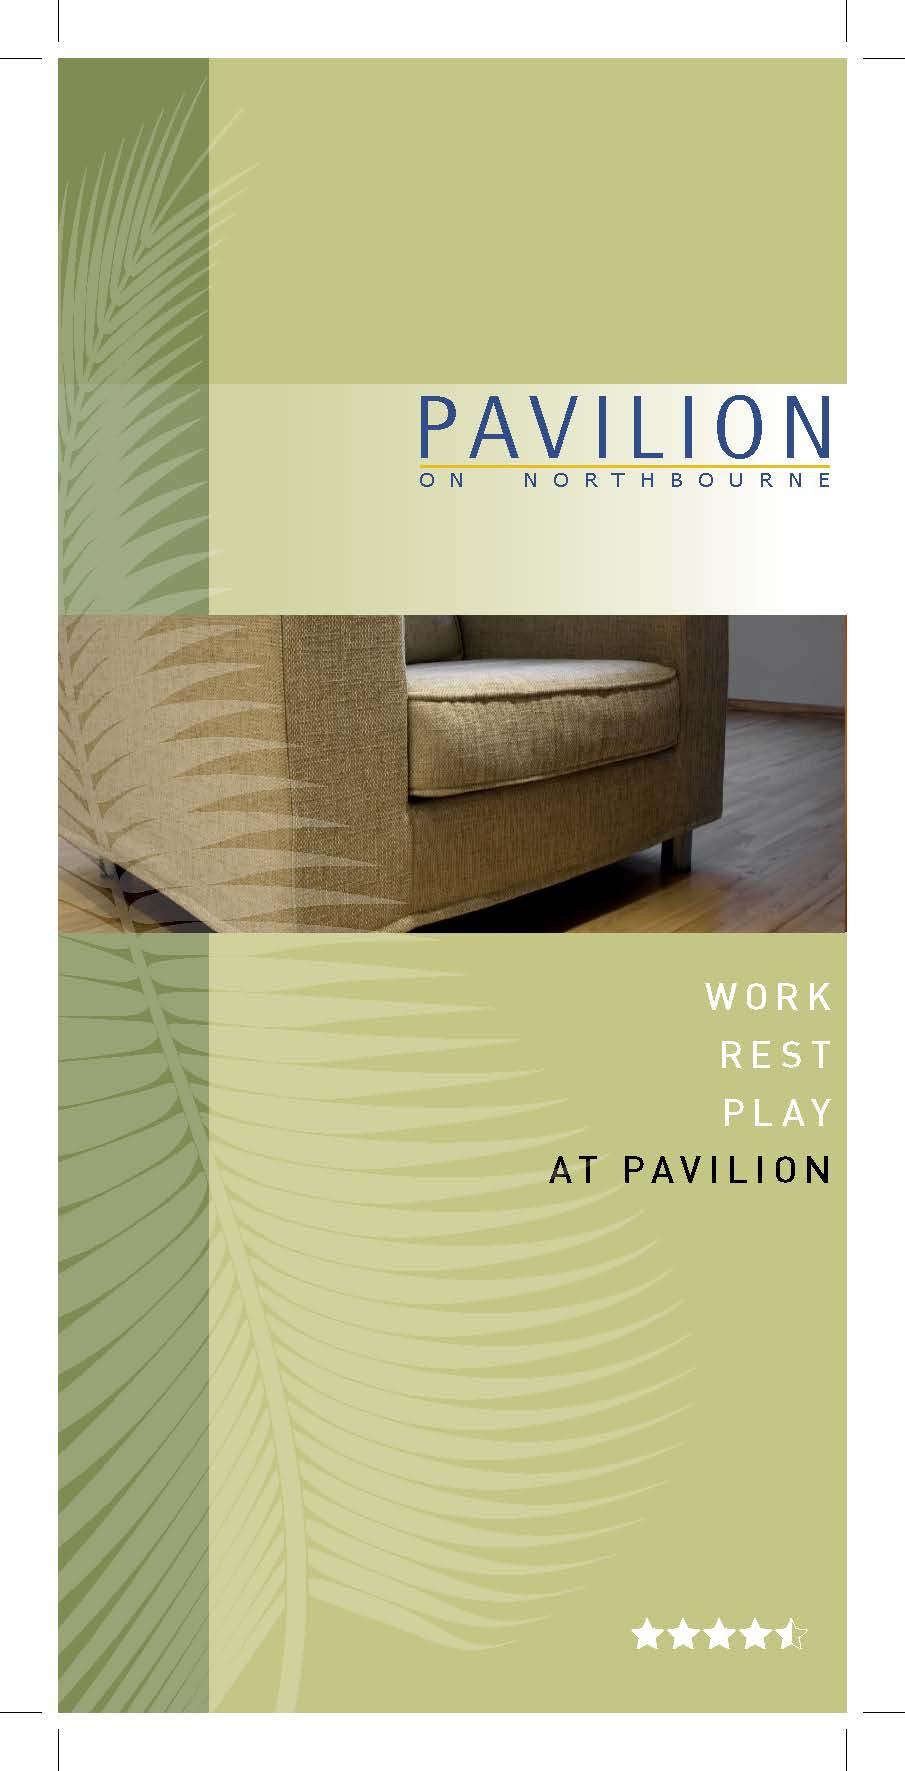 Pavilion DL pamphlet cover_Page_08